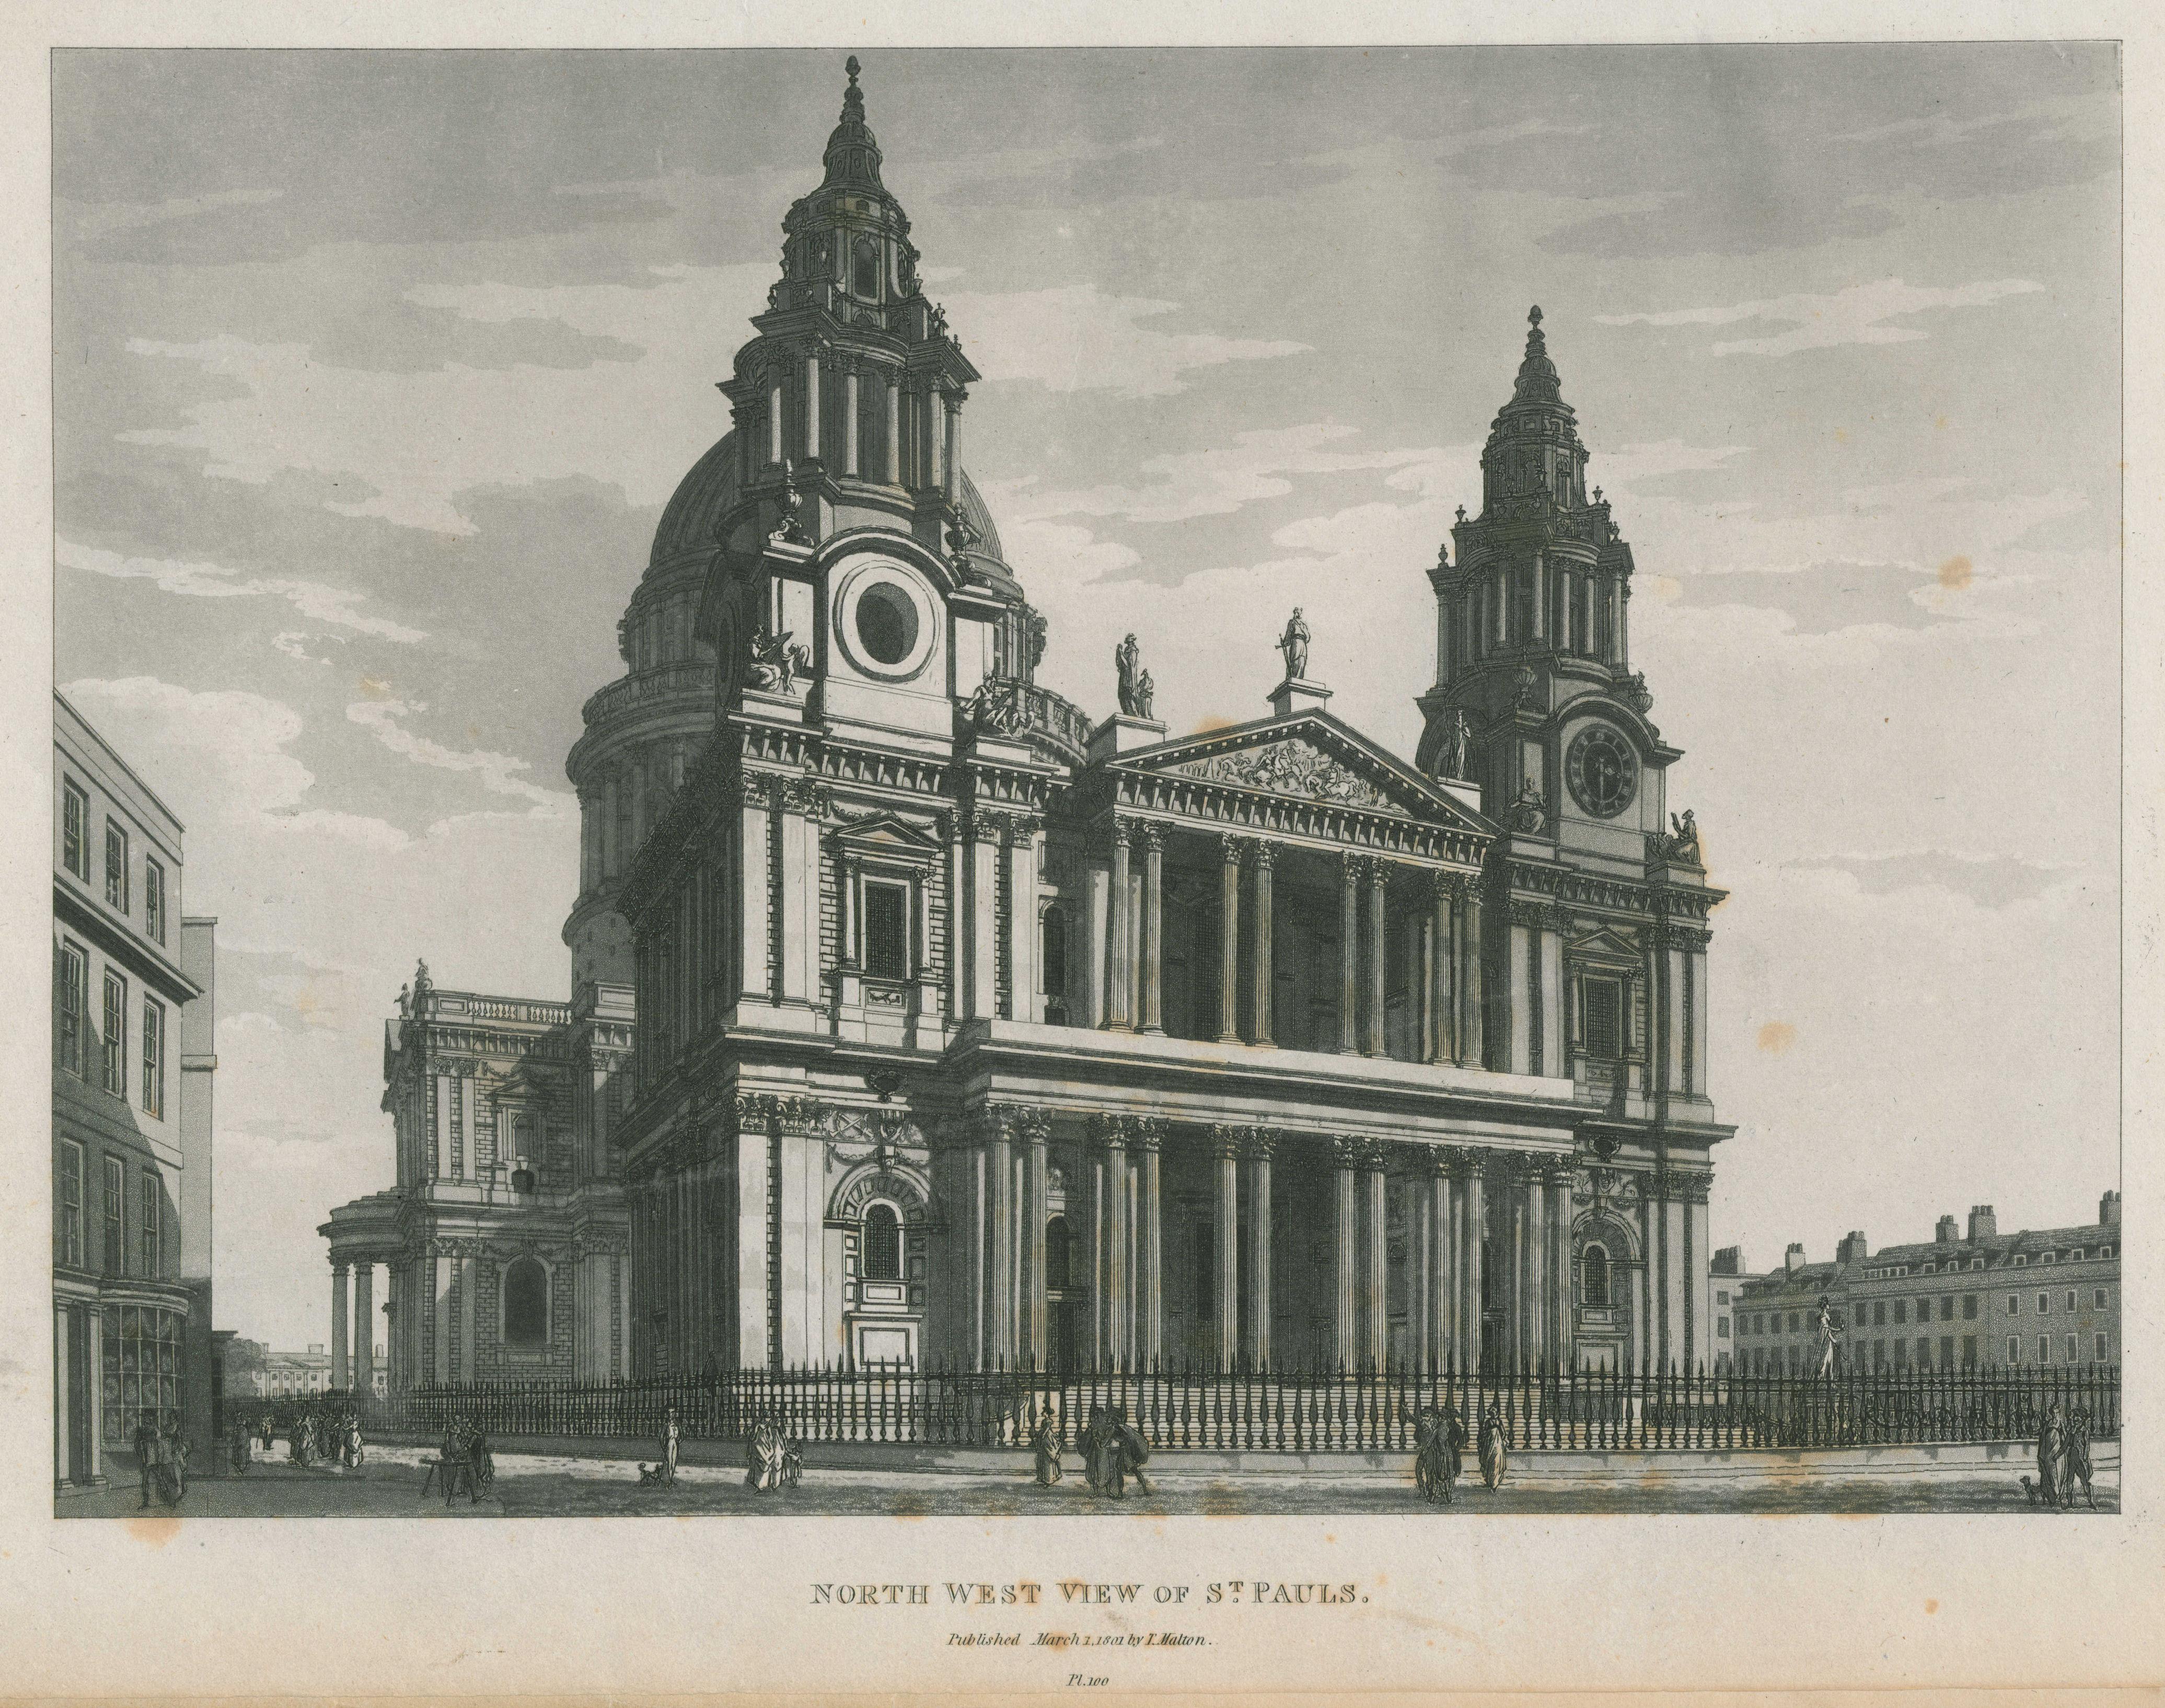 100 - Malton - North West View of St Paul's